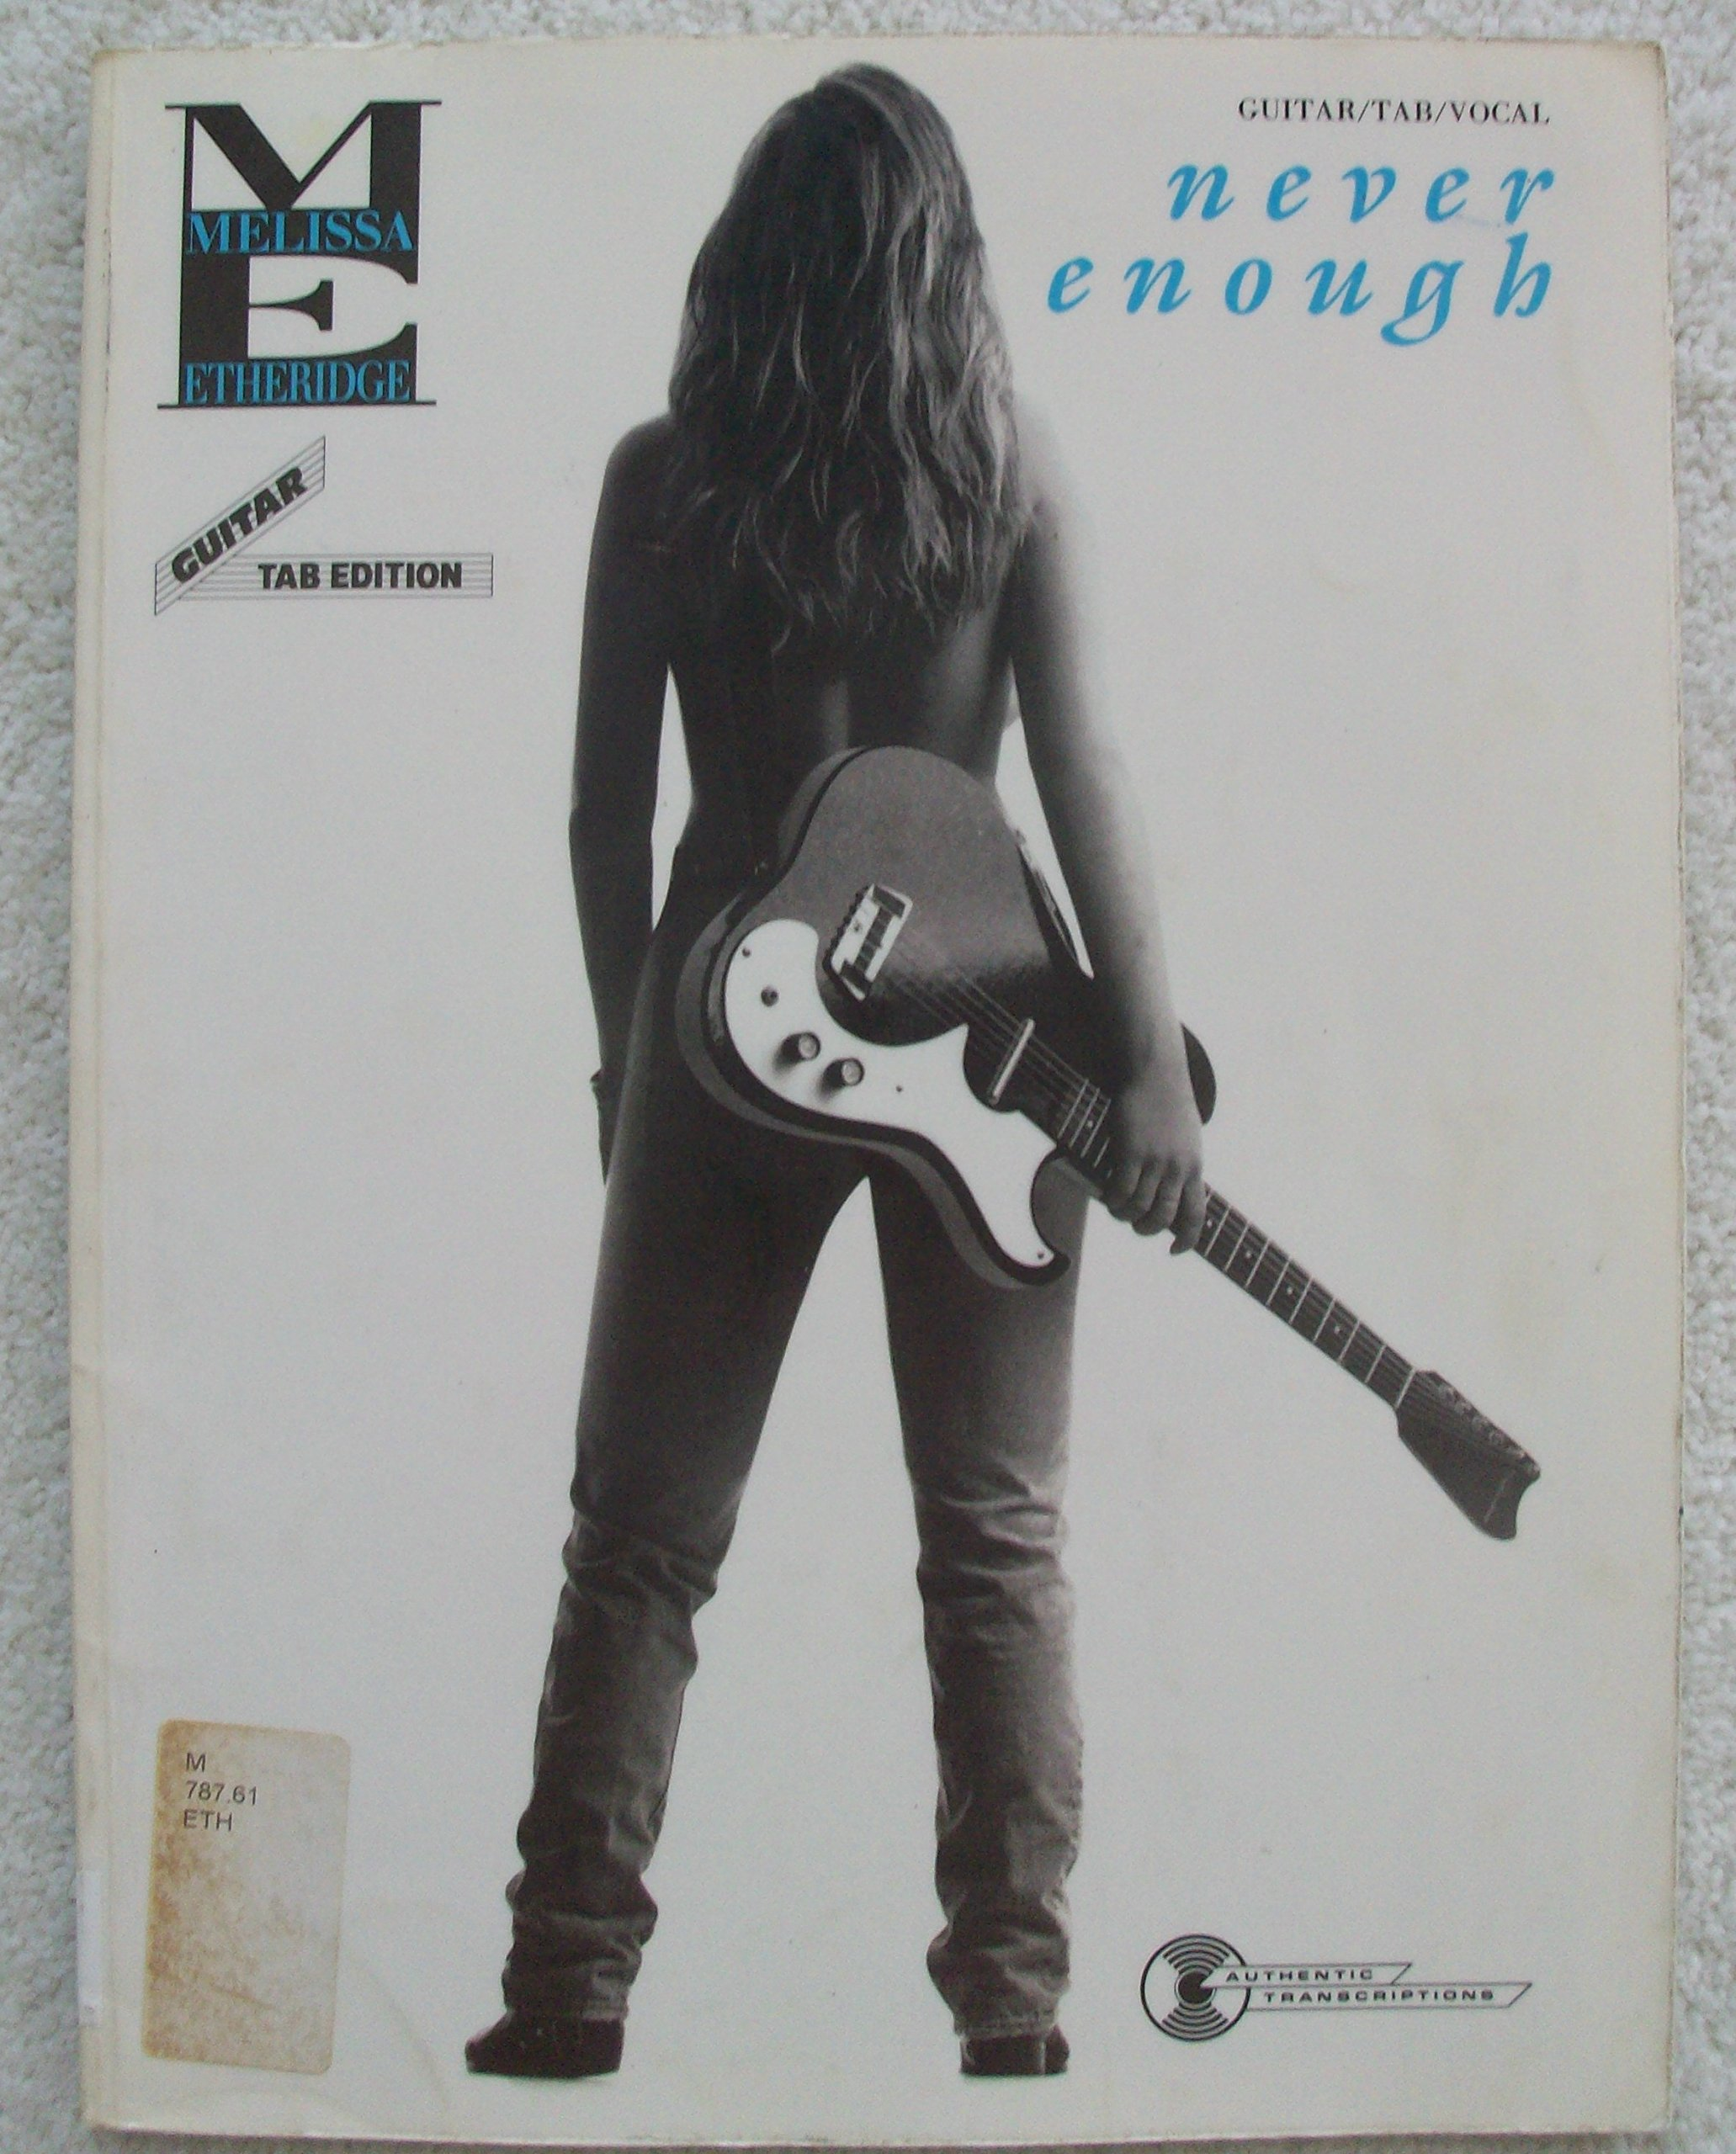 Melissa Etheridge -- Never Enough: Guitar/TAB/Vocal